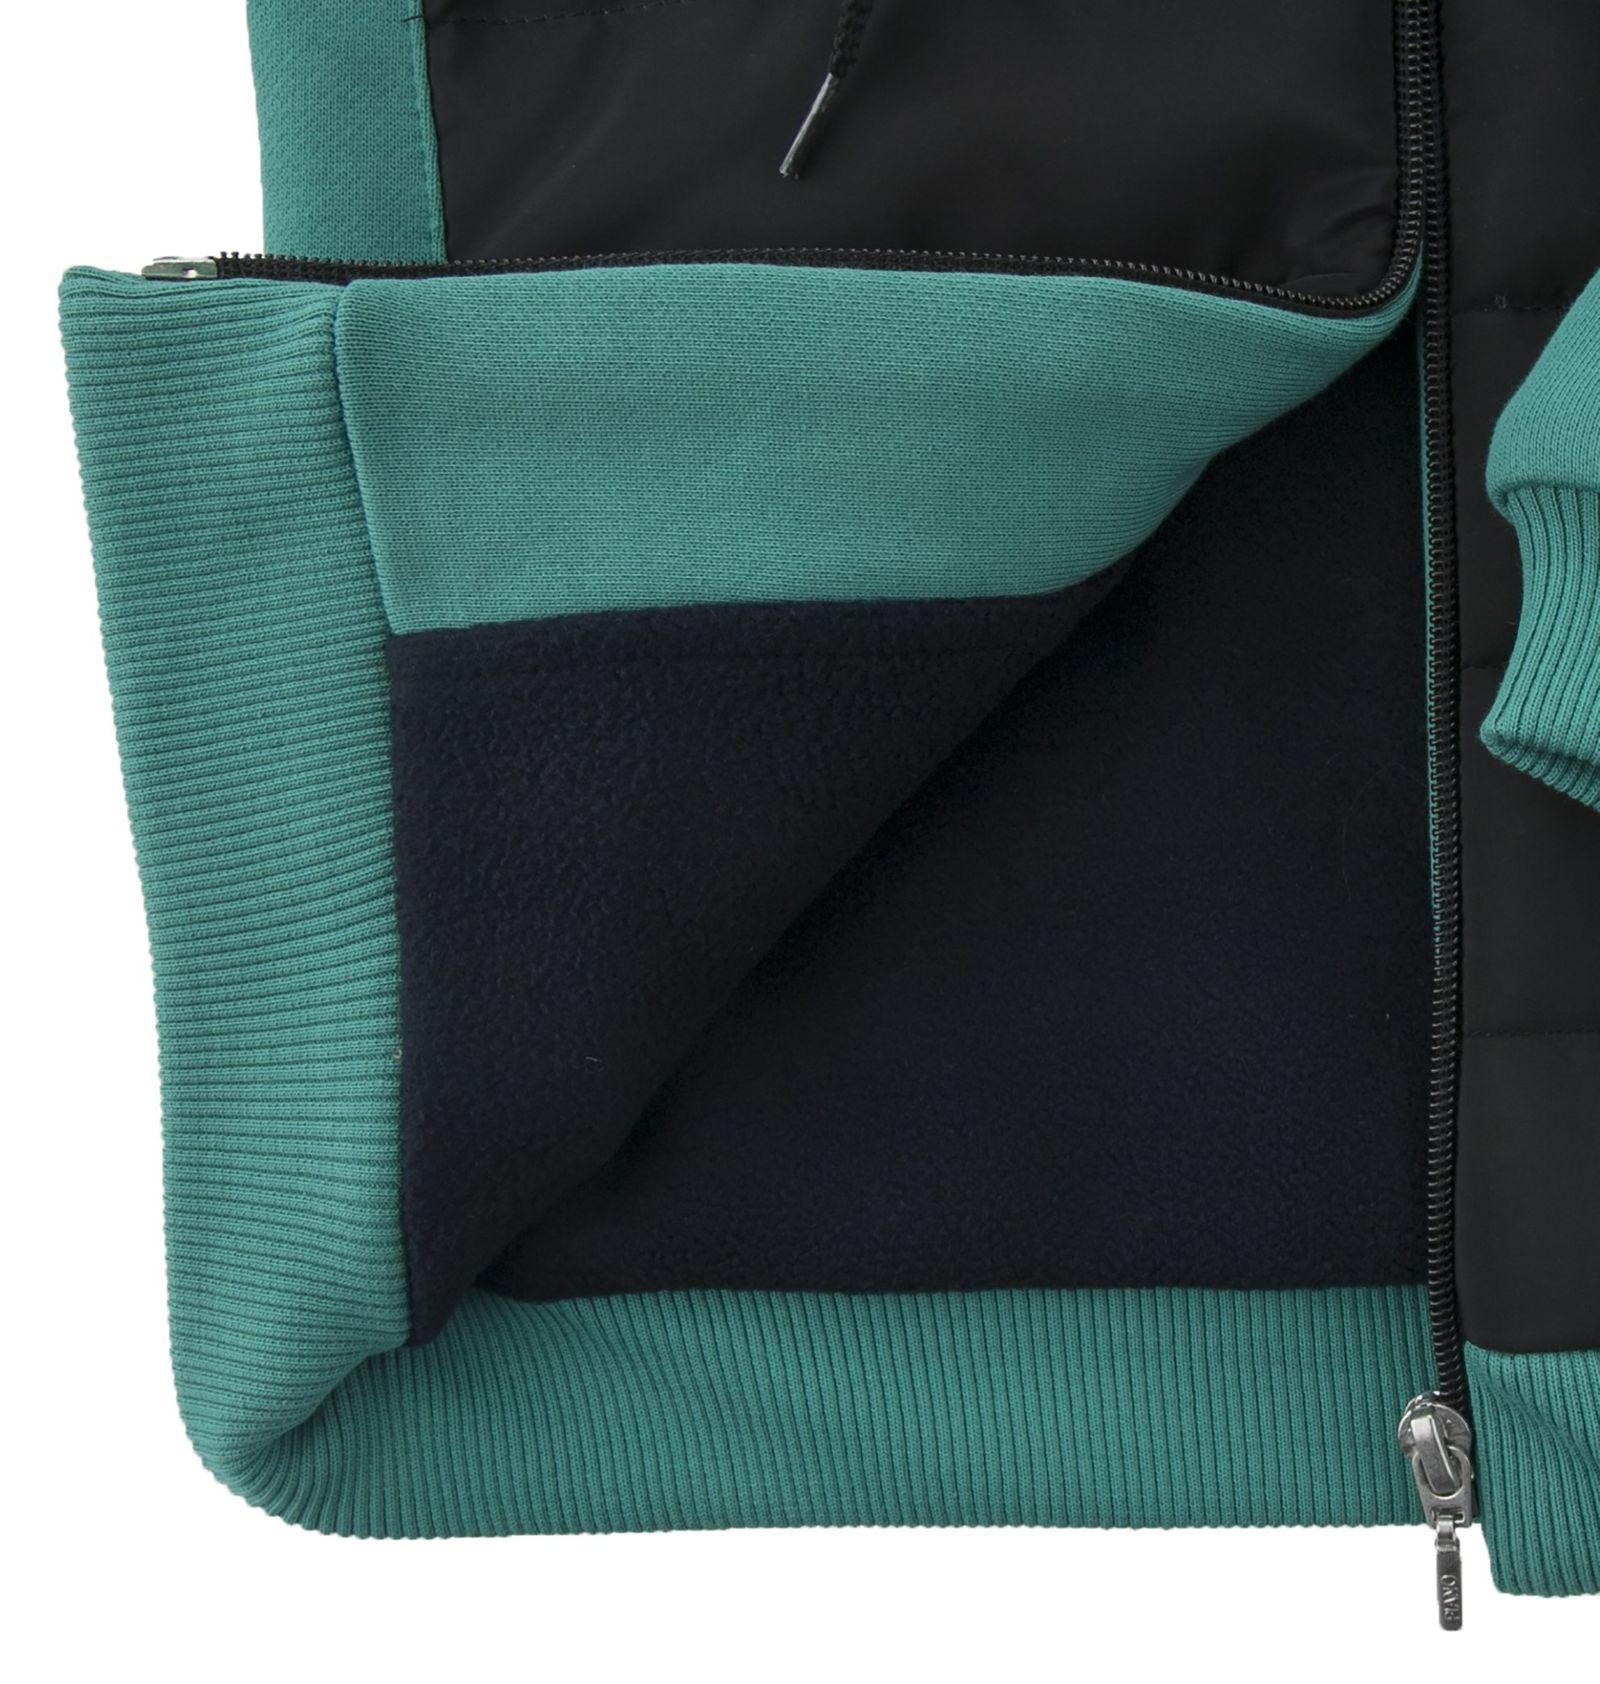 کاپشن نخی کلاه دار دخترانه - پیانو - سبز آبی - 4